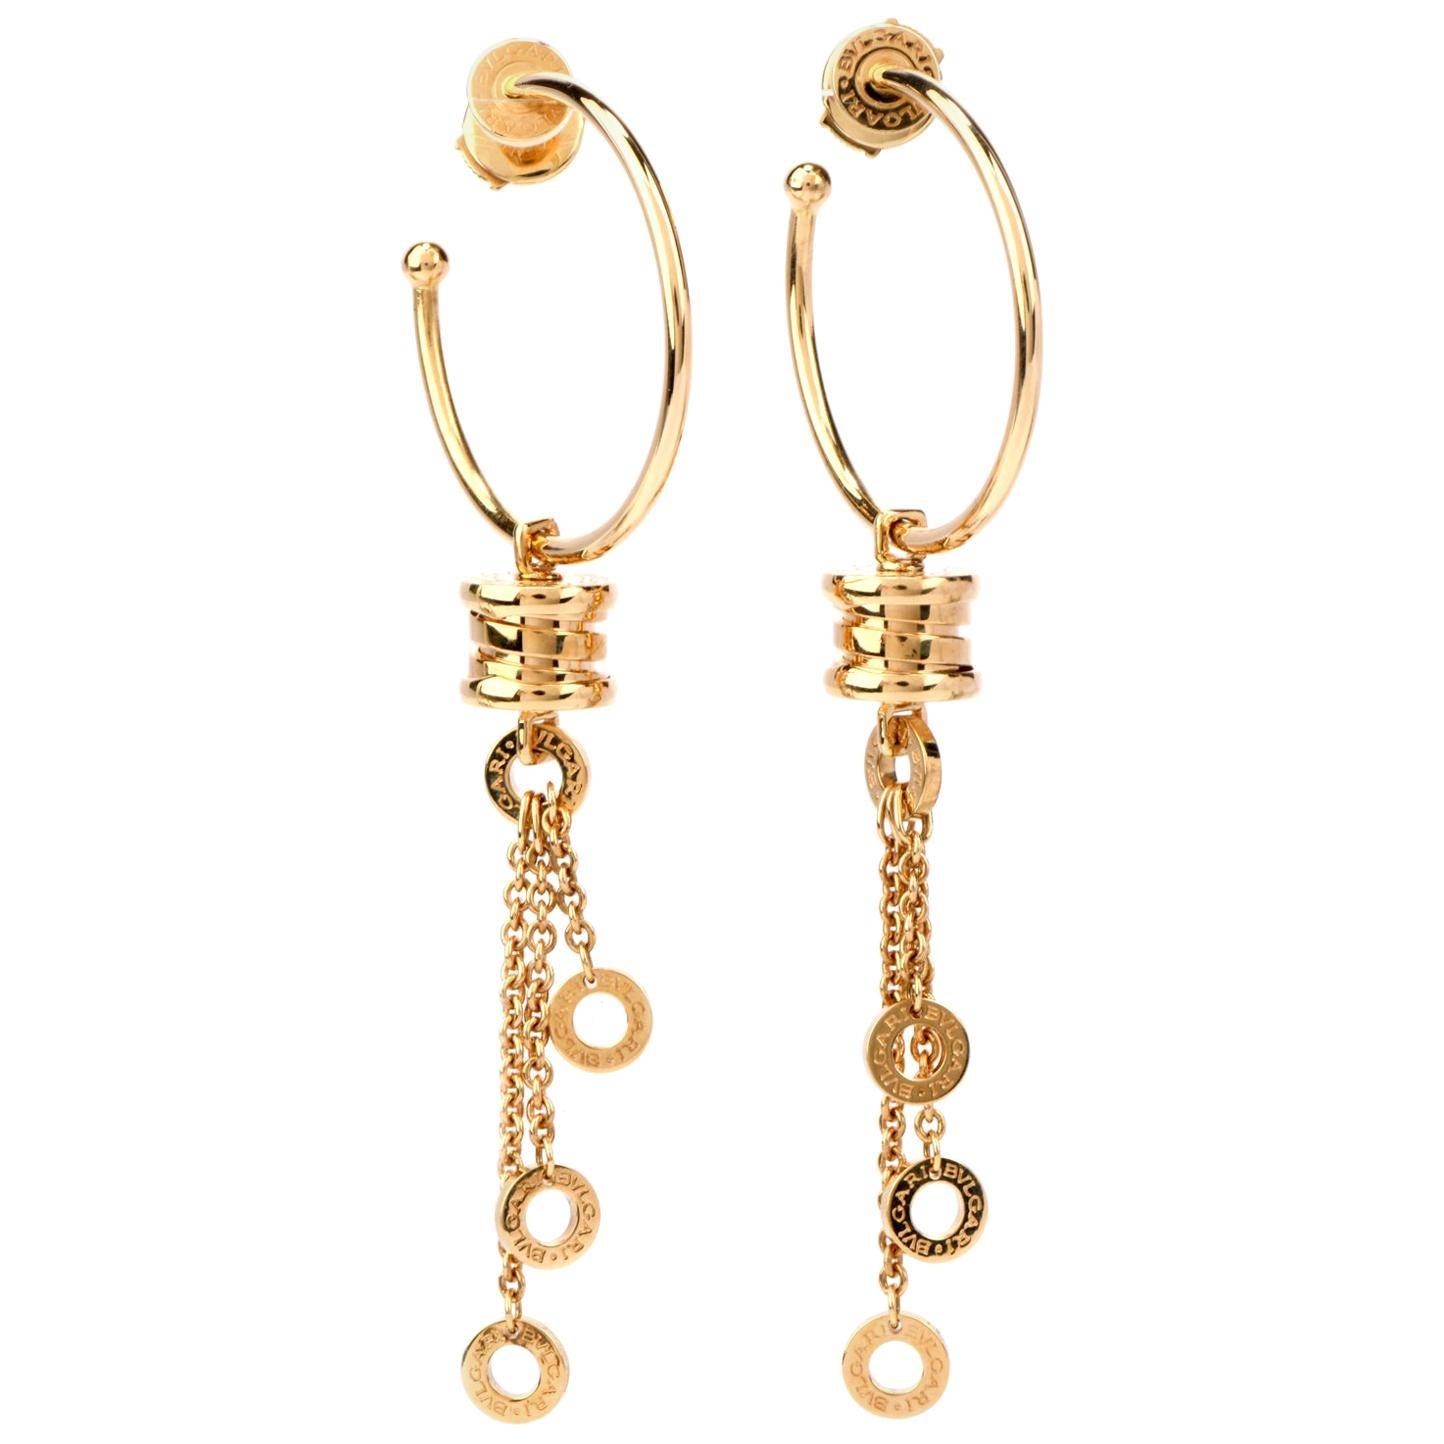 Bvlgari 18 Karat Gold B.Zero1 Dangle Hoop Earrings